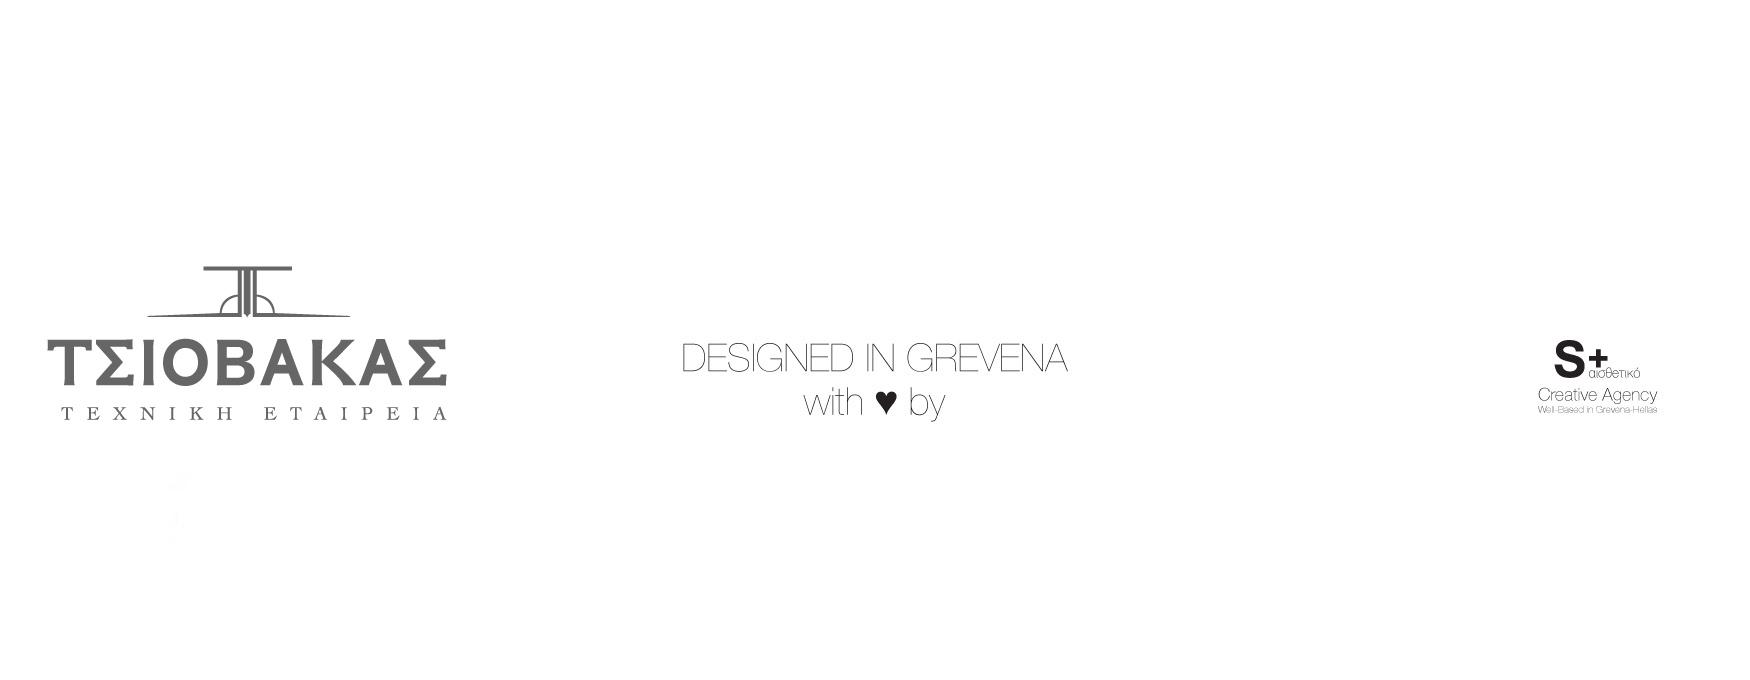 tsiovakas_logo_designed